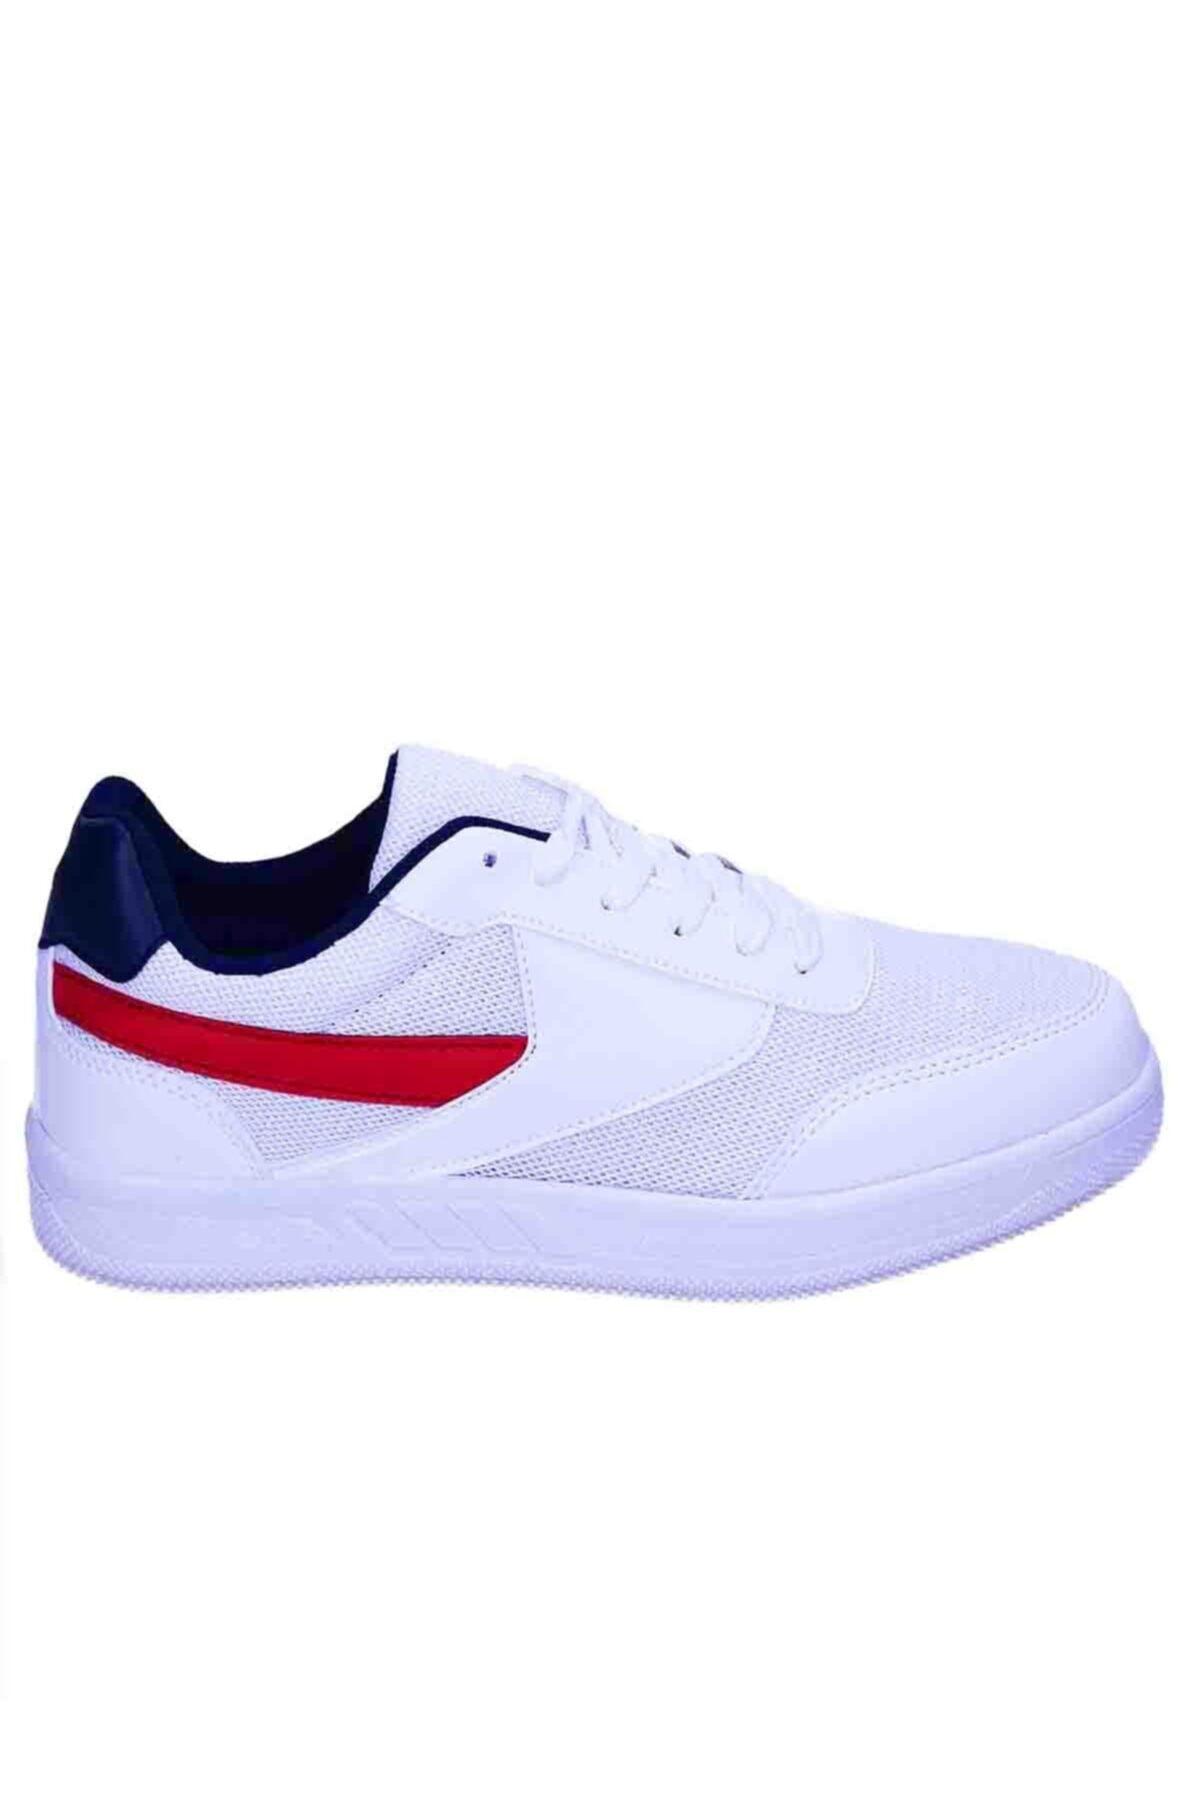 فروش پستی کفش اسپرت مردانه ترک برند SNKRS کد ty89803656